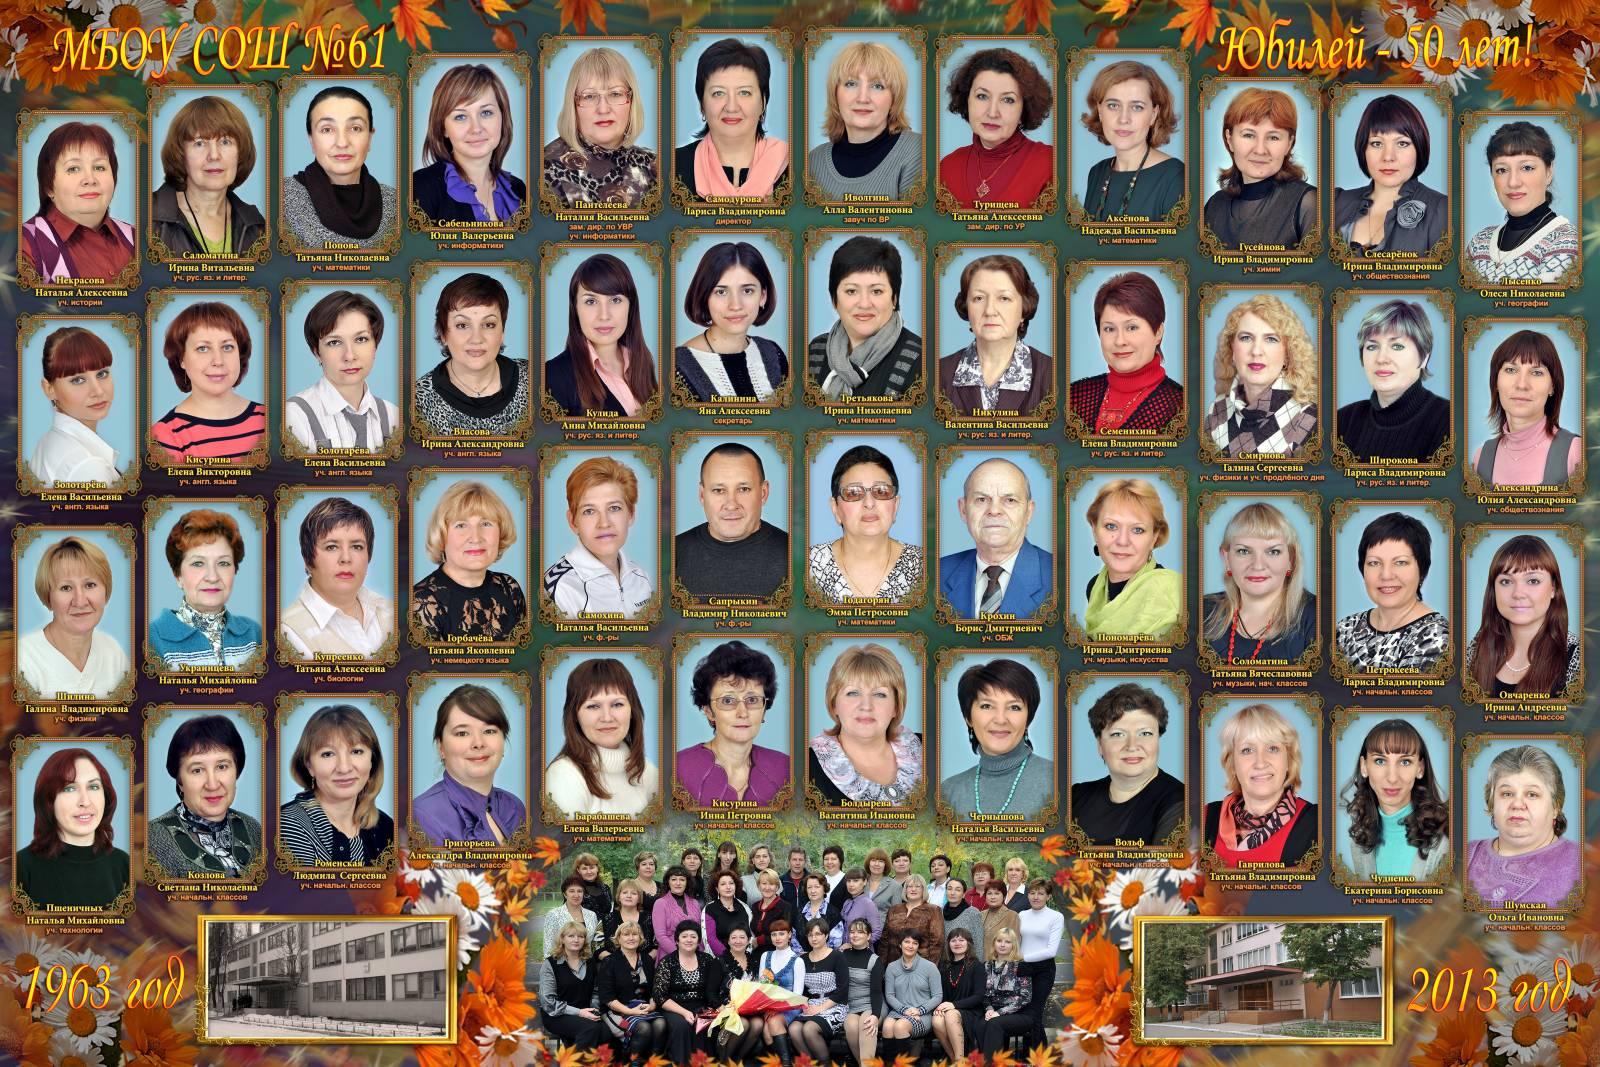 Rr5710-0001rpng w:ussr w:russian sfsr w:republics of the soviet union